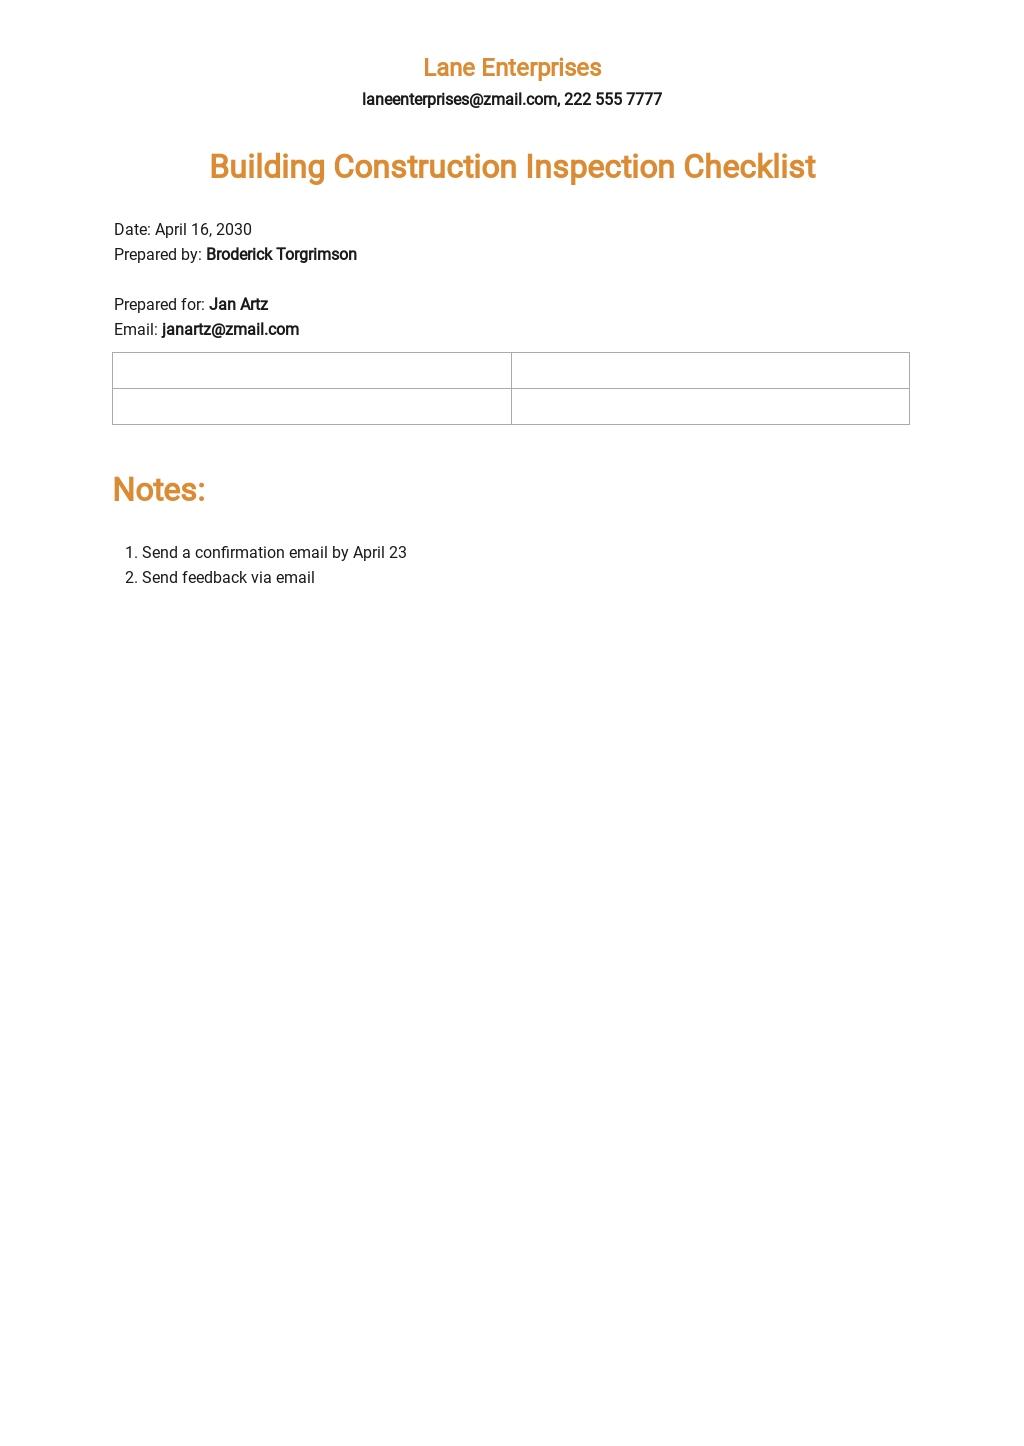 Building Construction Inspection Checklist Template